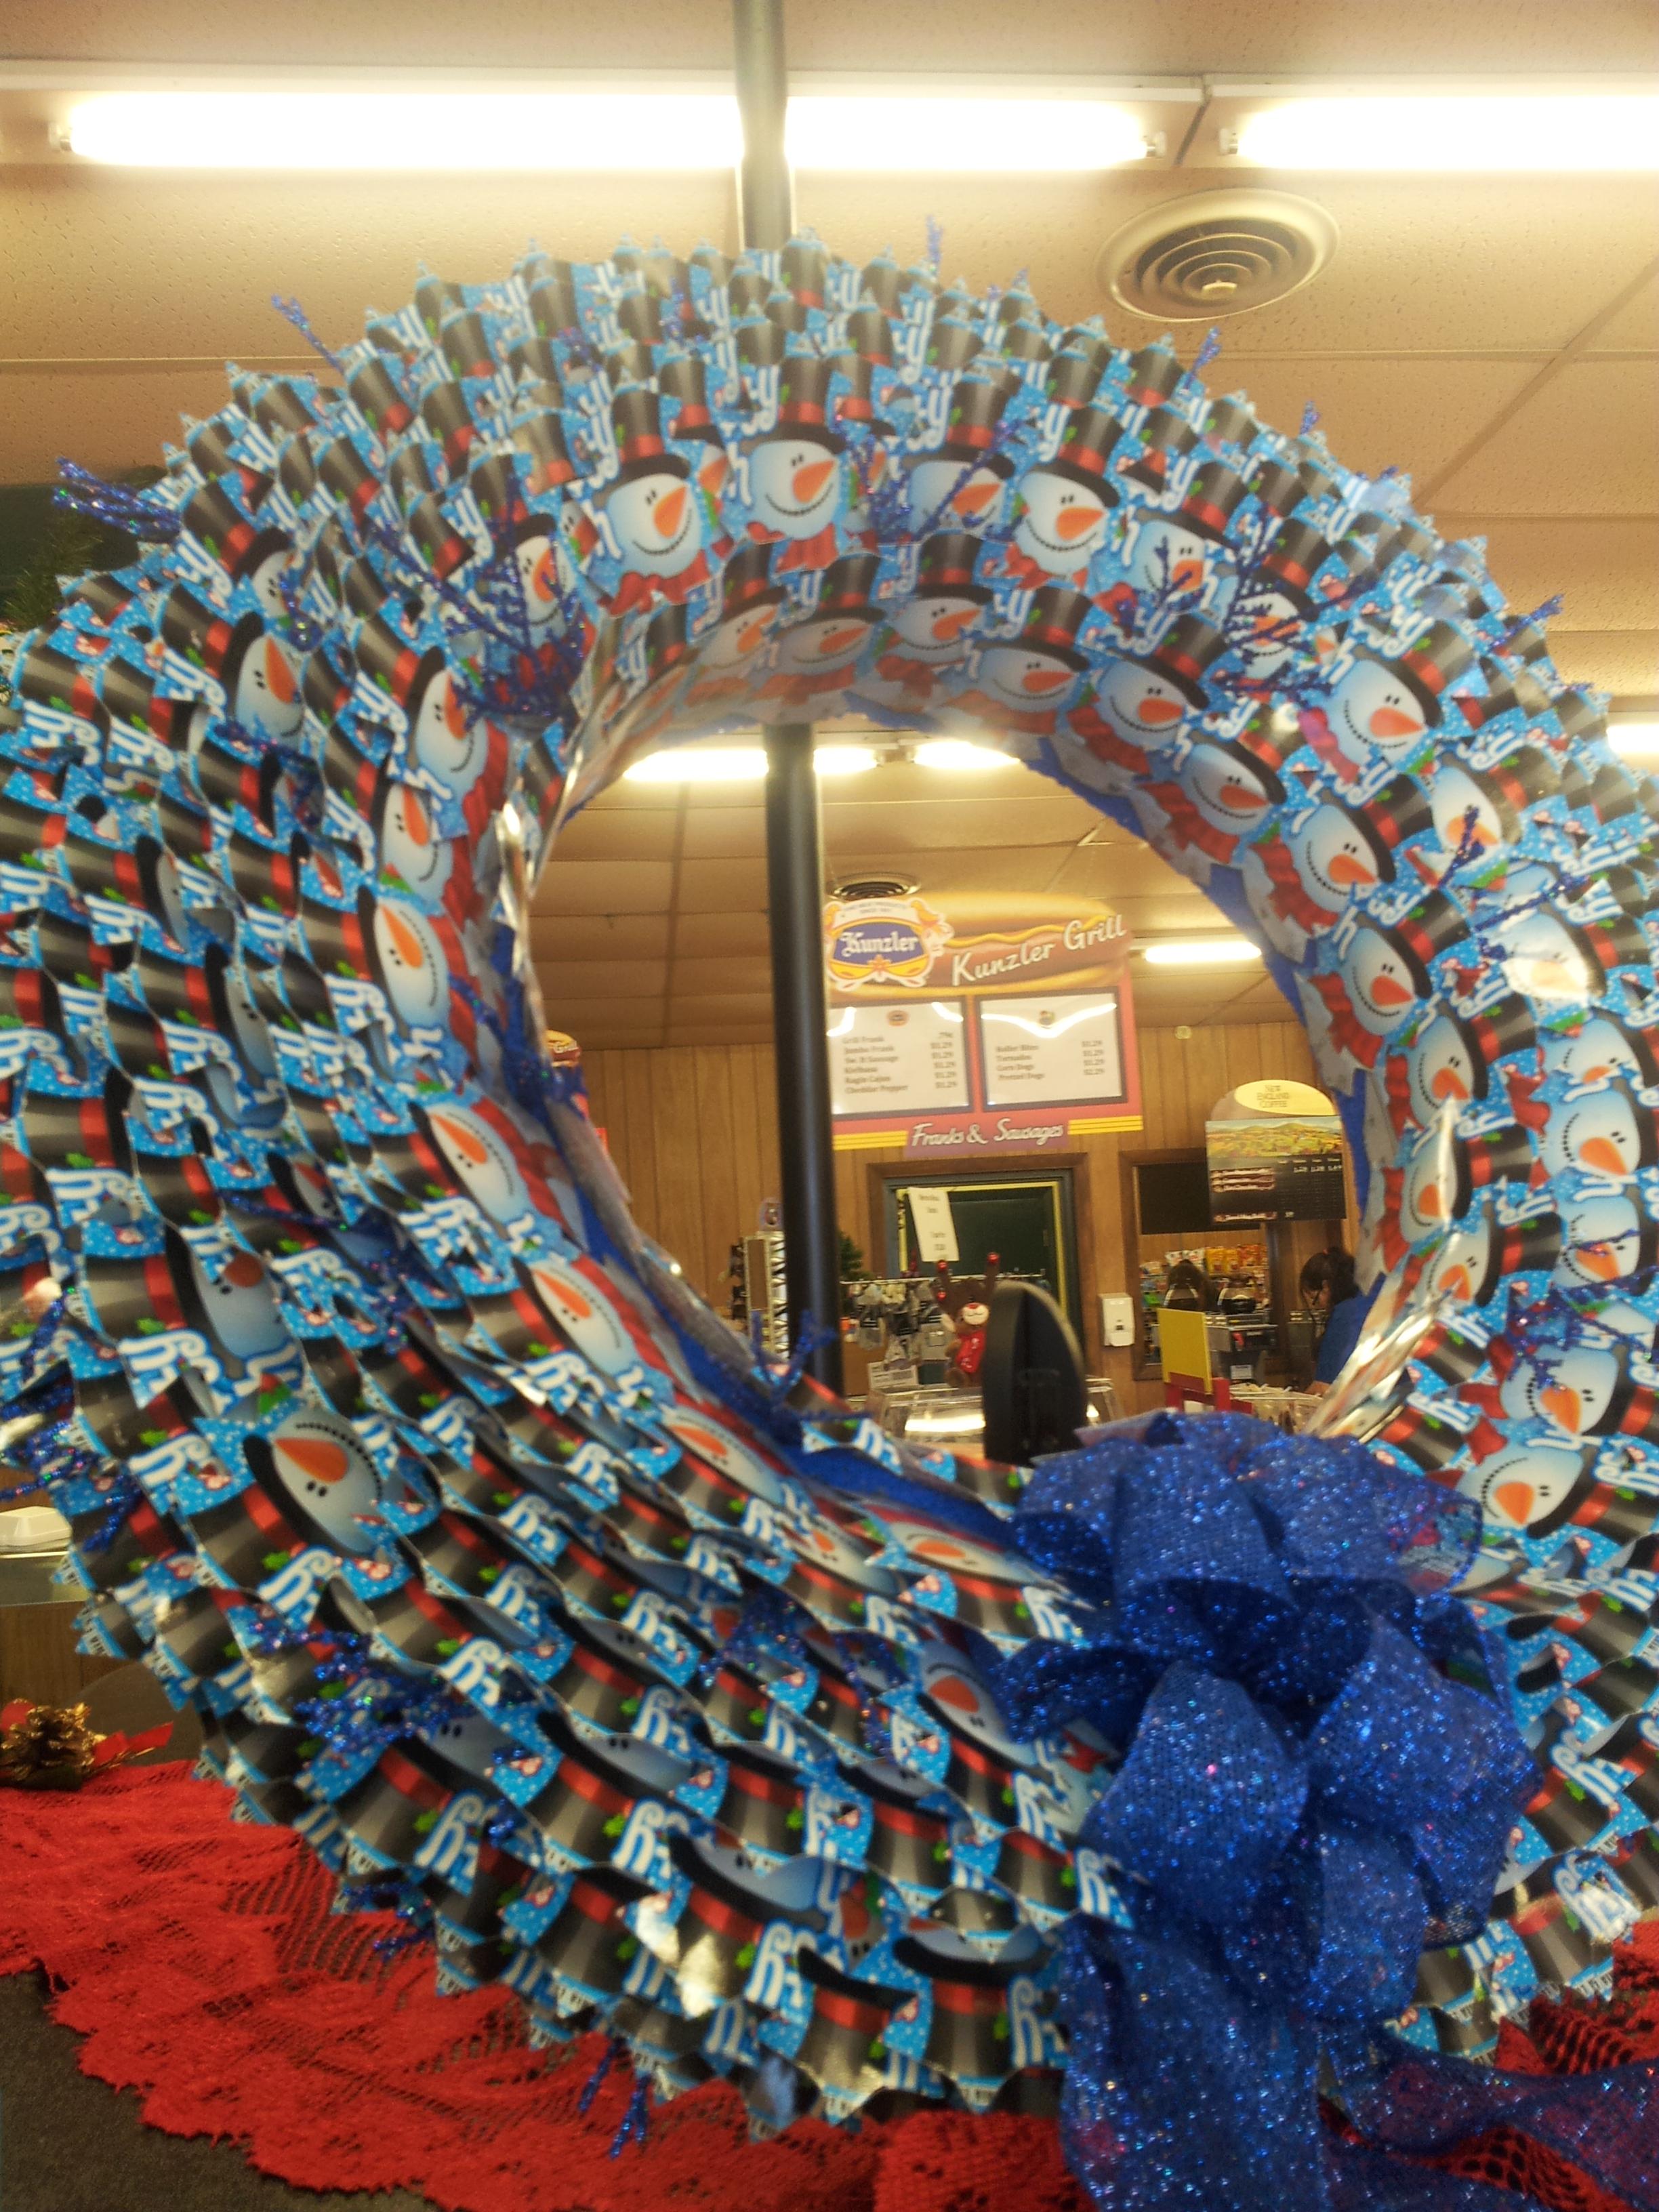 Bonus Photos Lottery Tickets Ornaments Suquehanna Reporting